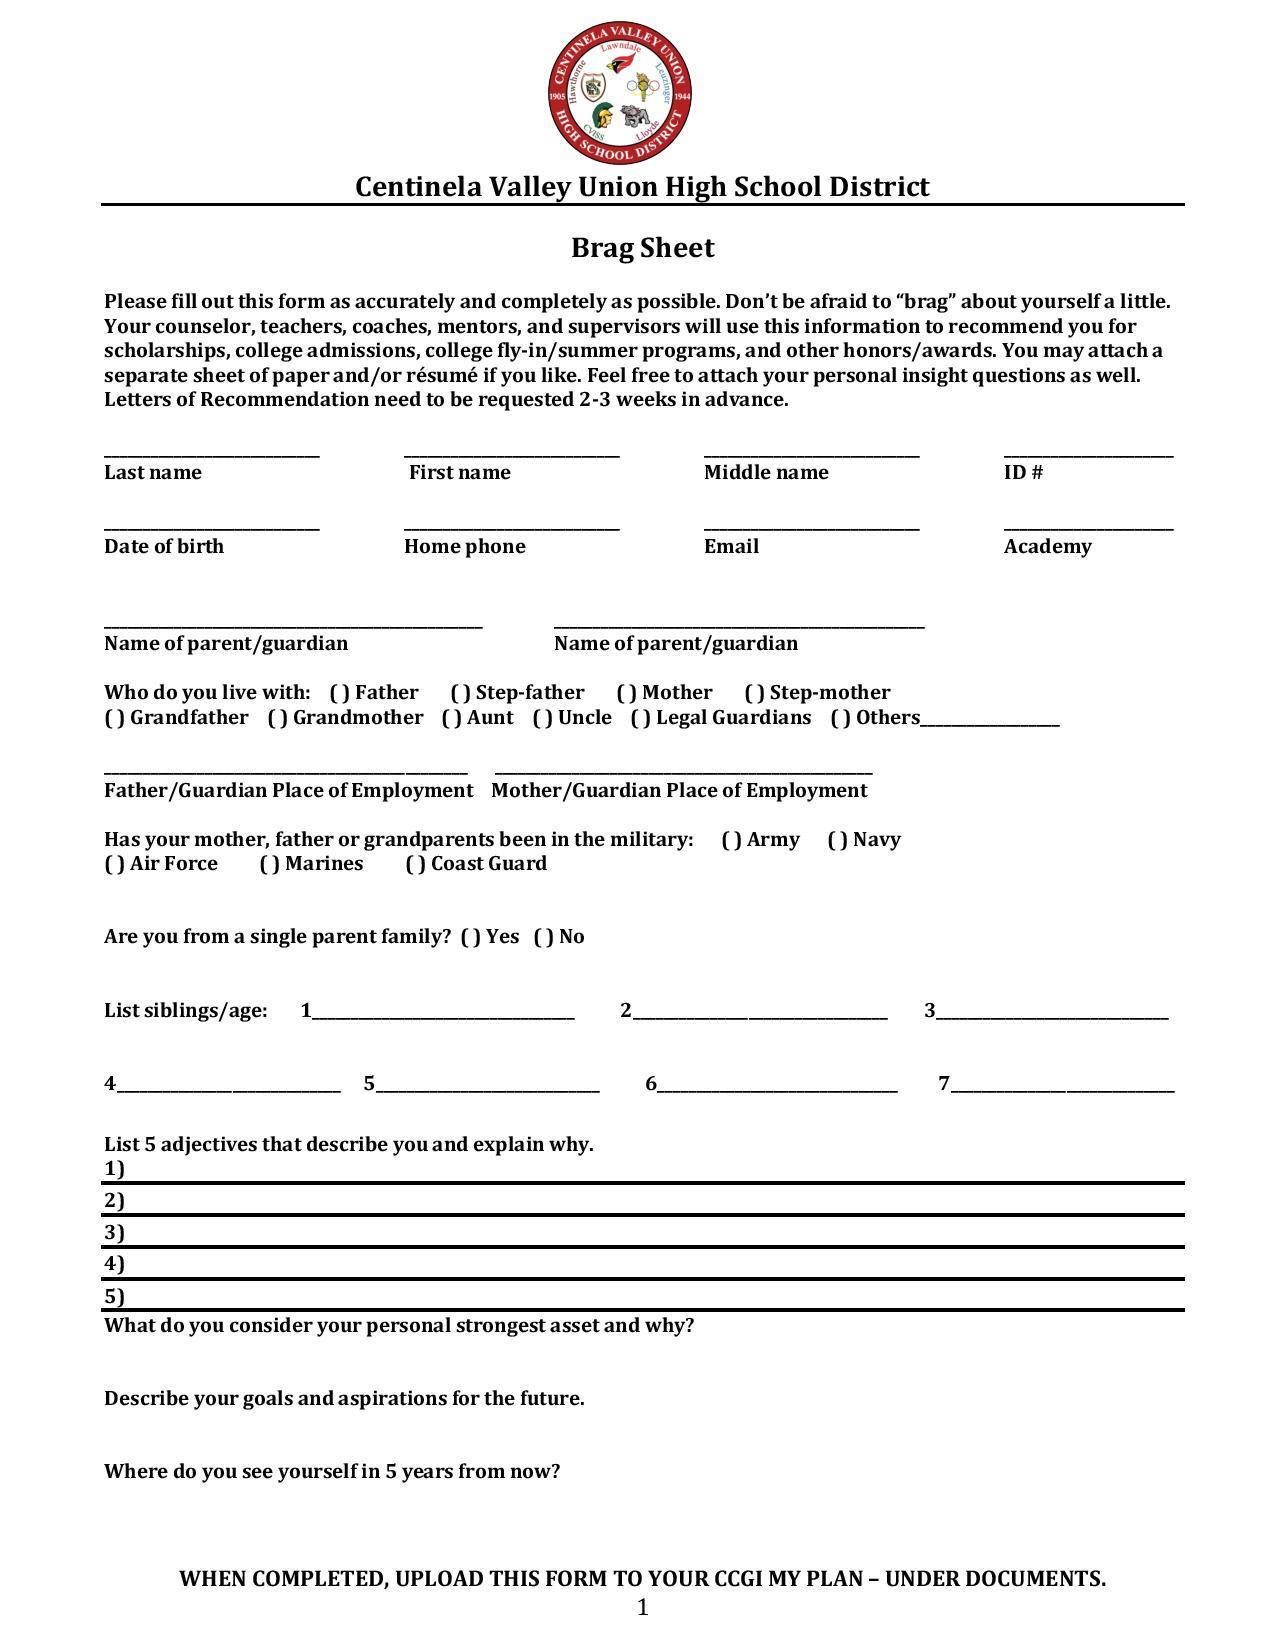 Brag Sheet Letter Of Rec Counseling Lawndale High School